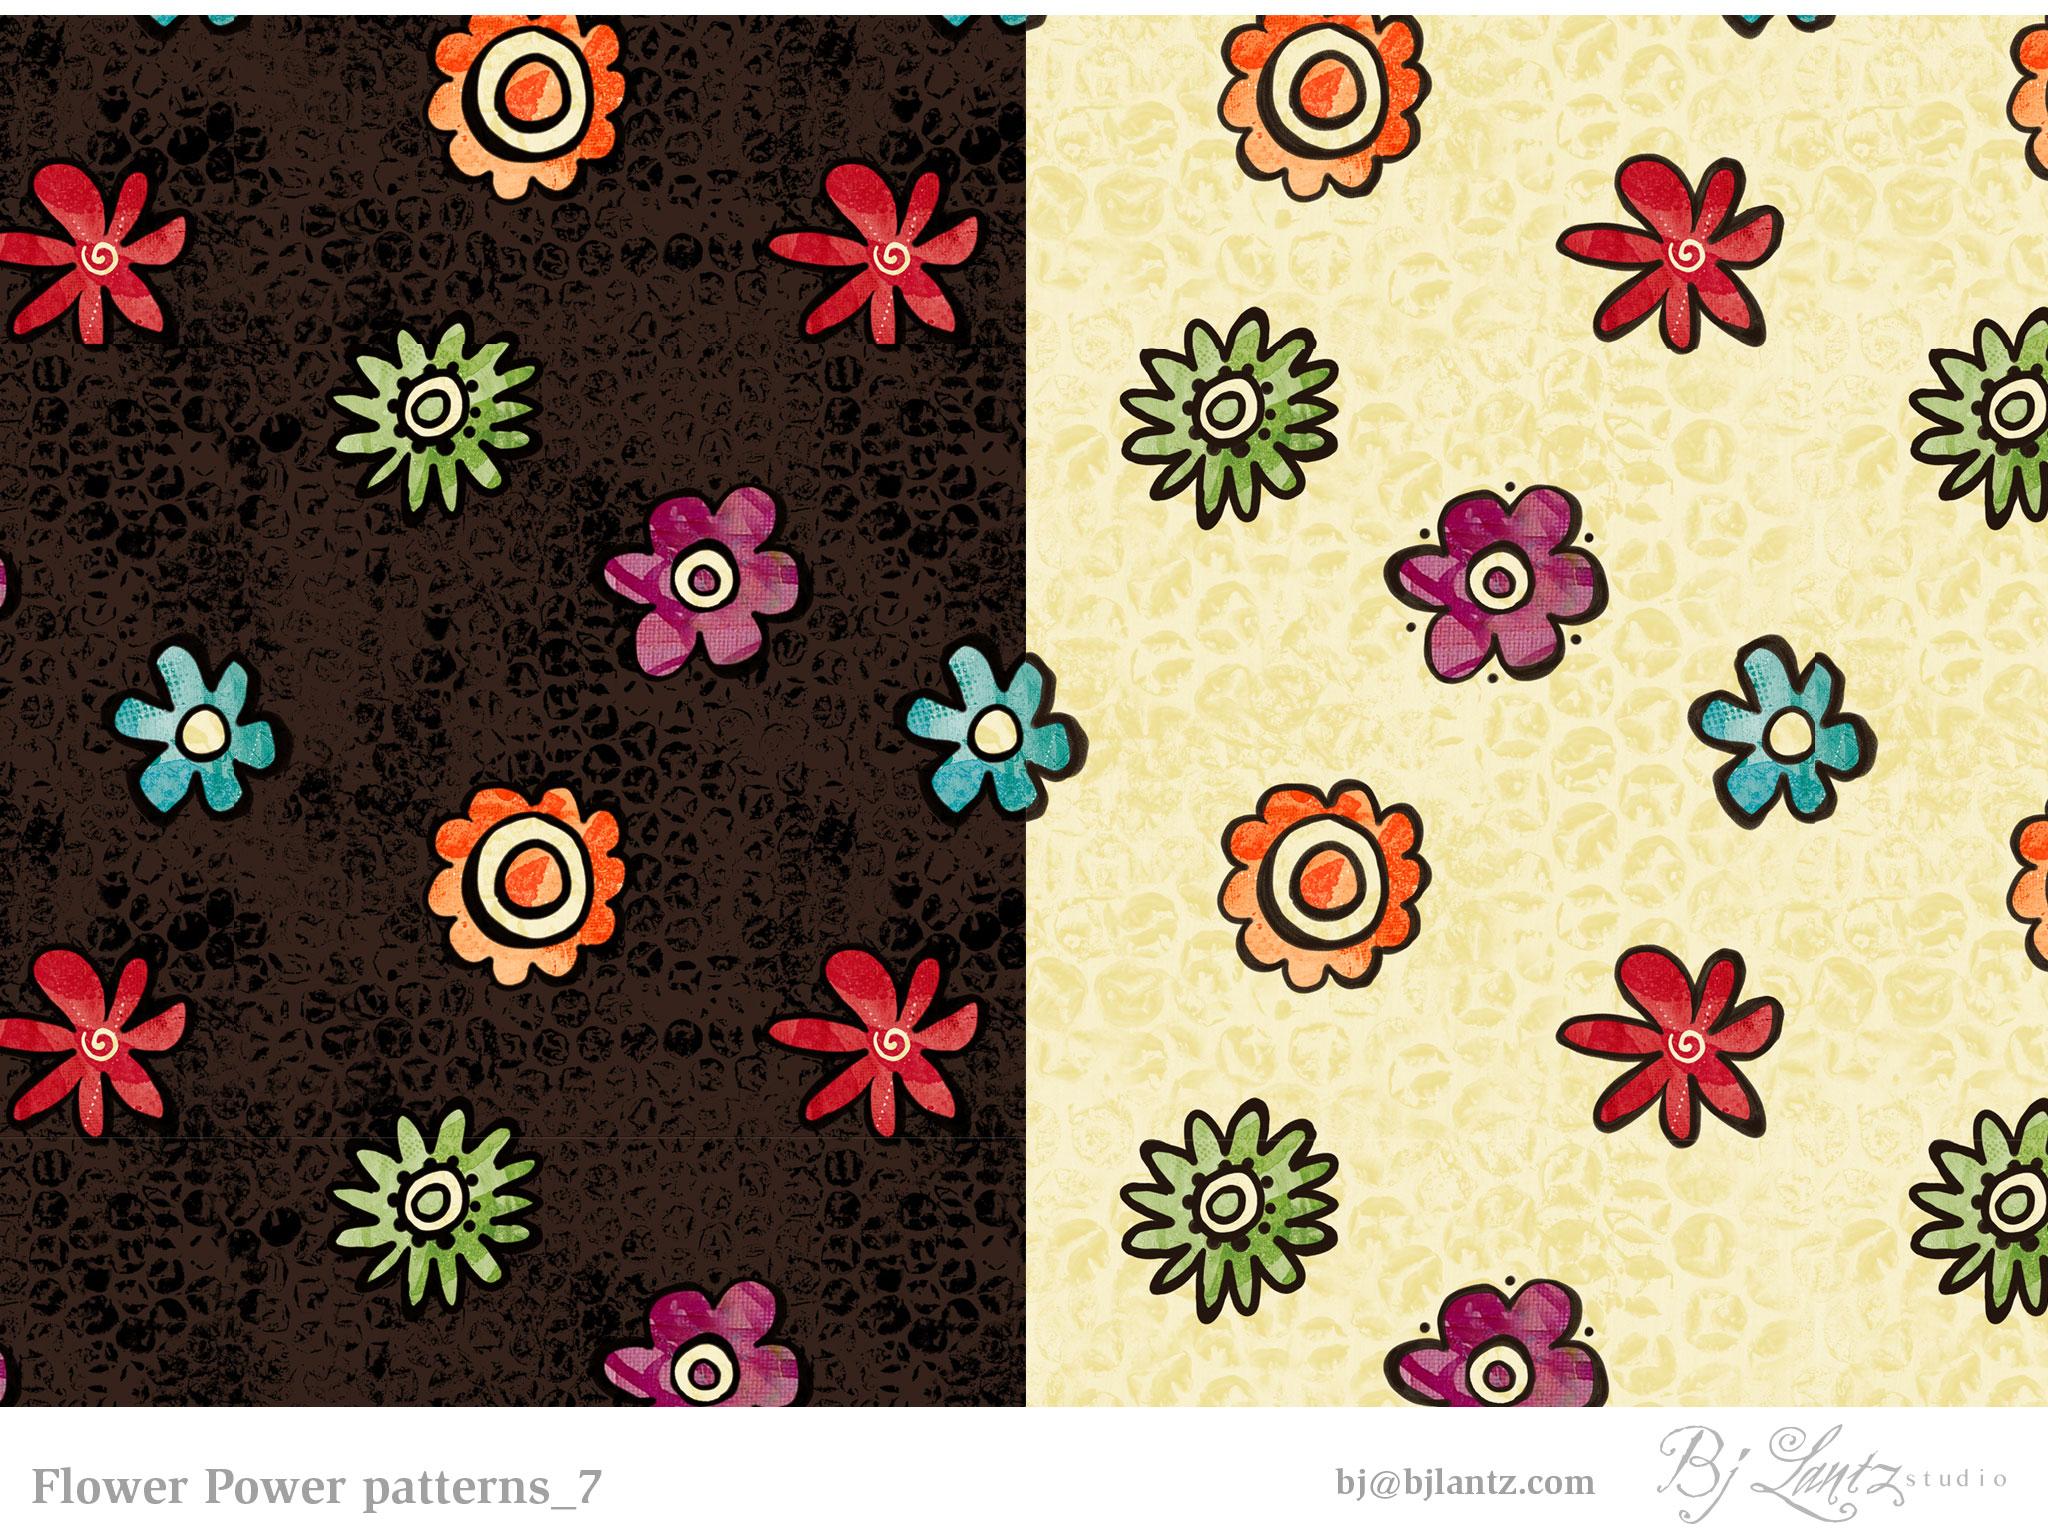 FlowerPower_BJLantz_12.jpg